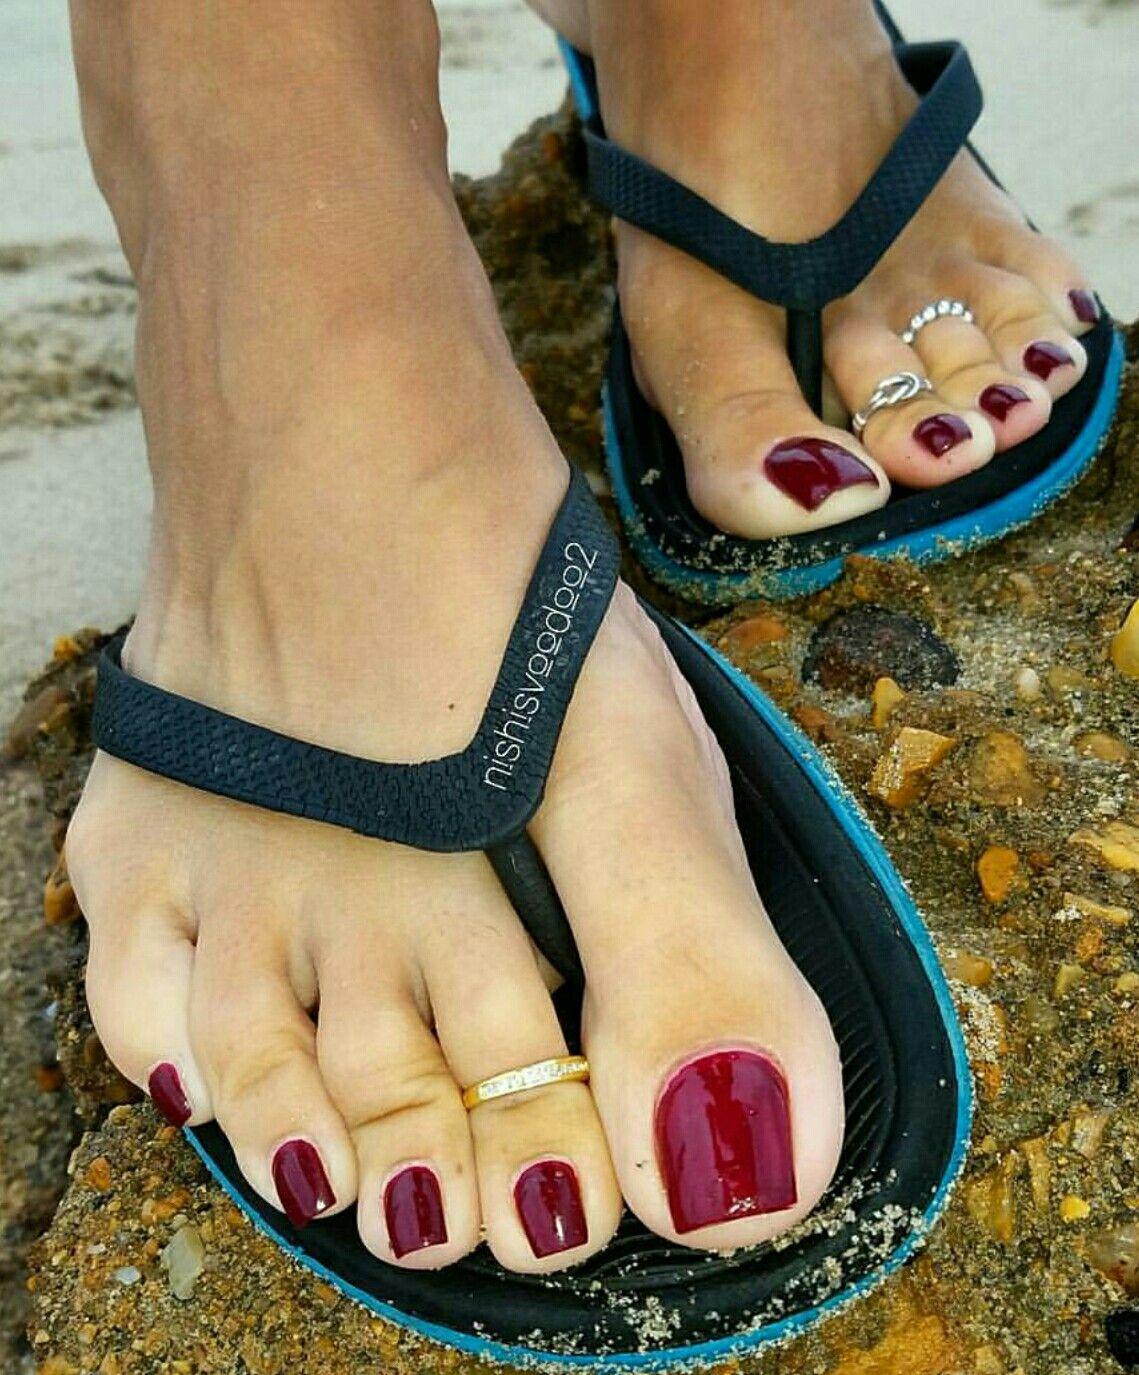 sexede fødder body to body jylland